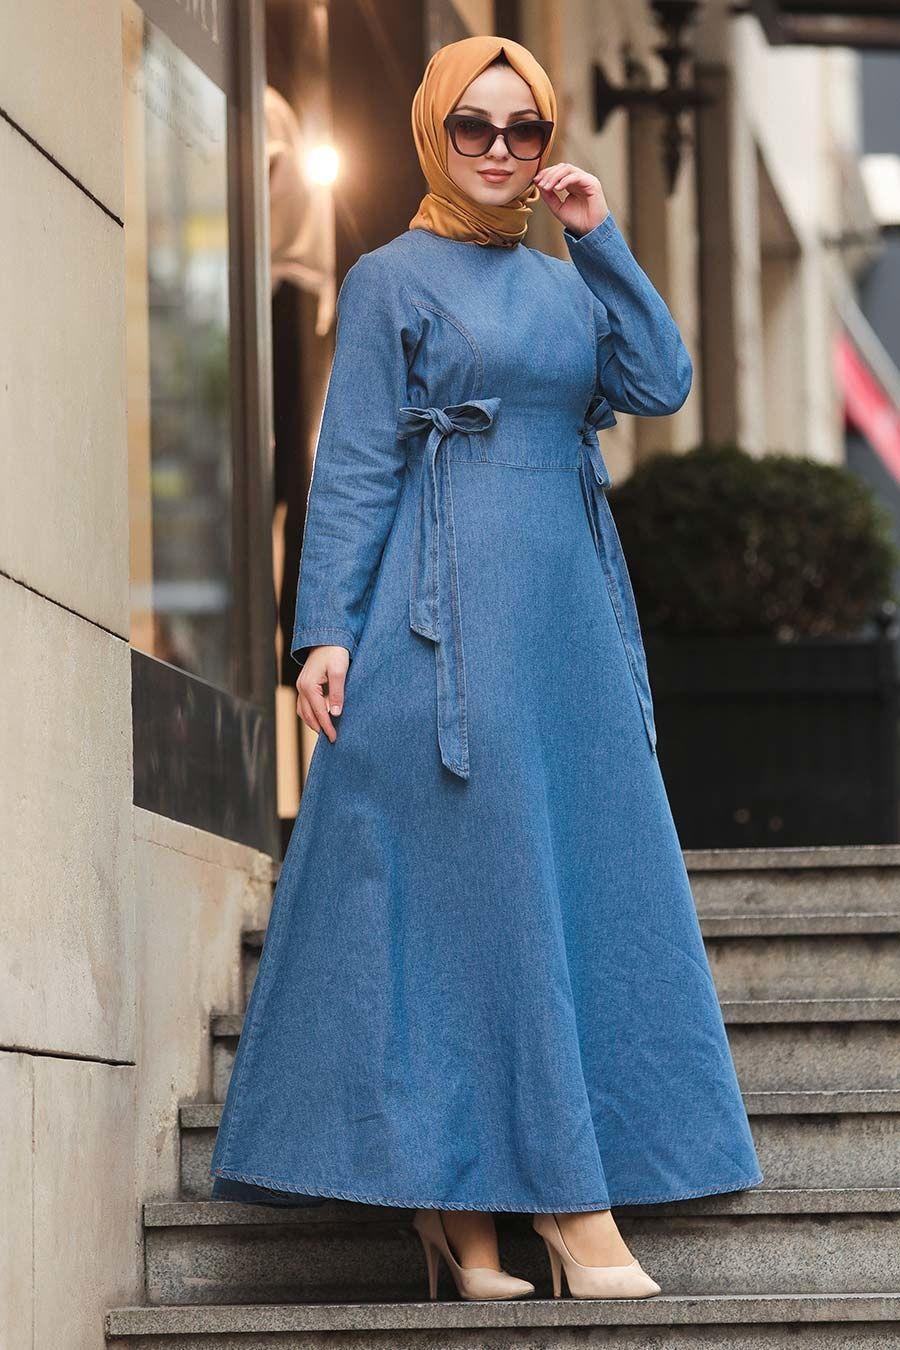 Neva Style Mavi Tesettur Kot Elbise 43190m Tesetturisland Com 2020 Mavi Uzun Elbiseler Kot Elbiseler The Dress